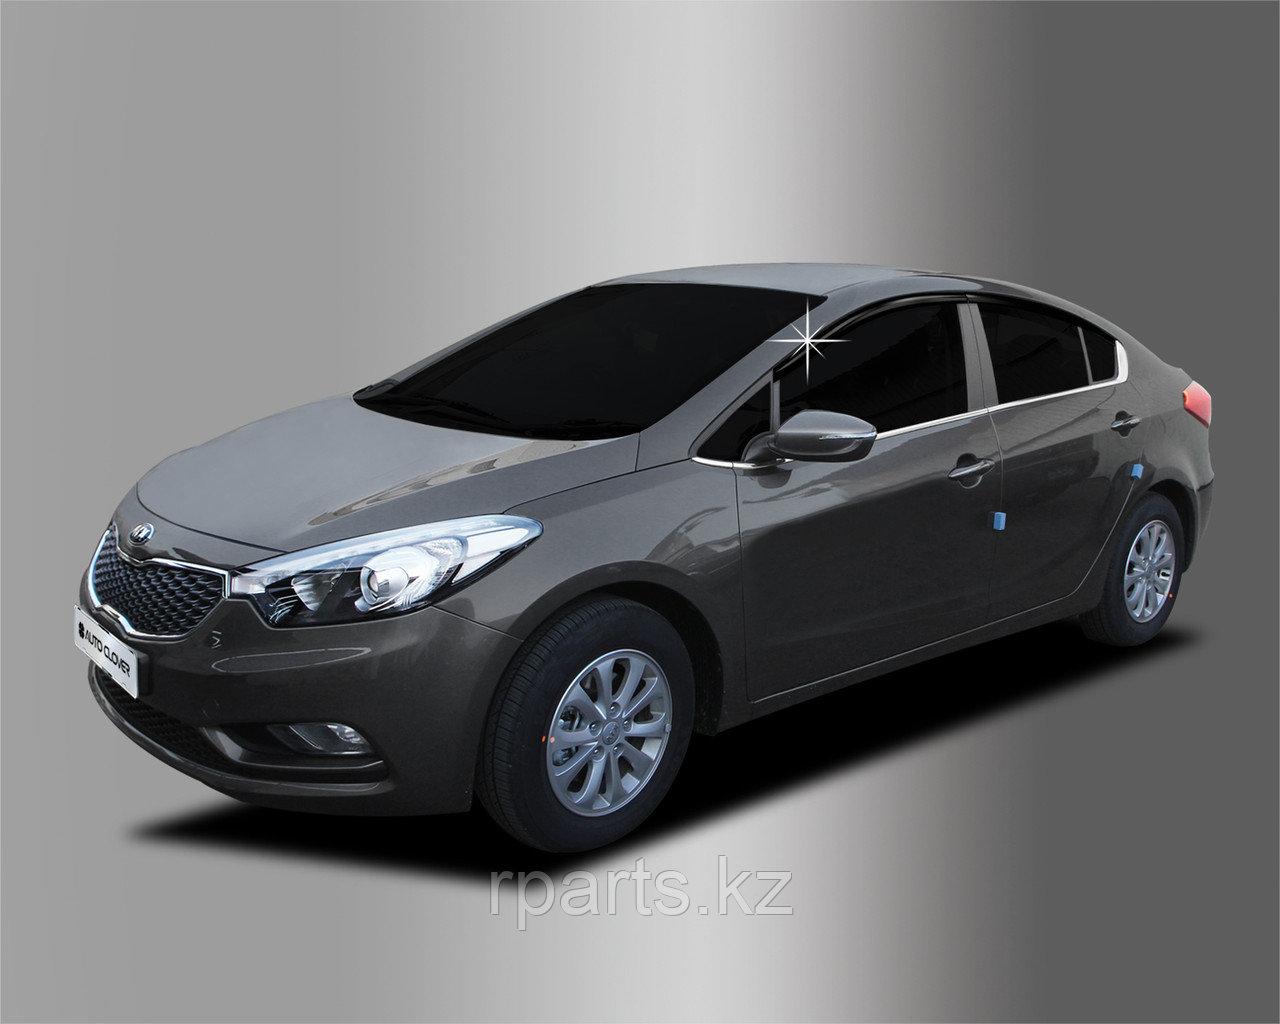 Дефлекторы боковых окон для Kia Cerato 2013-2014